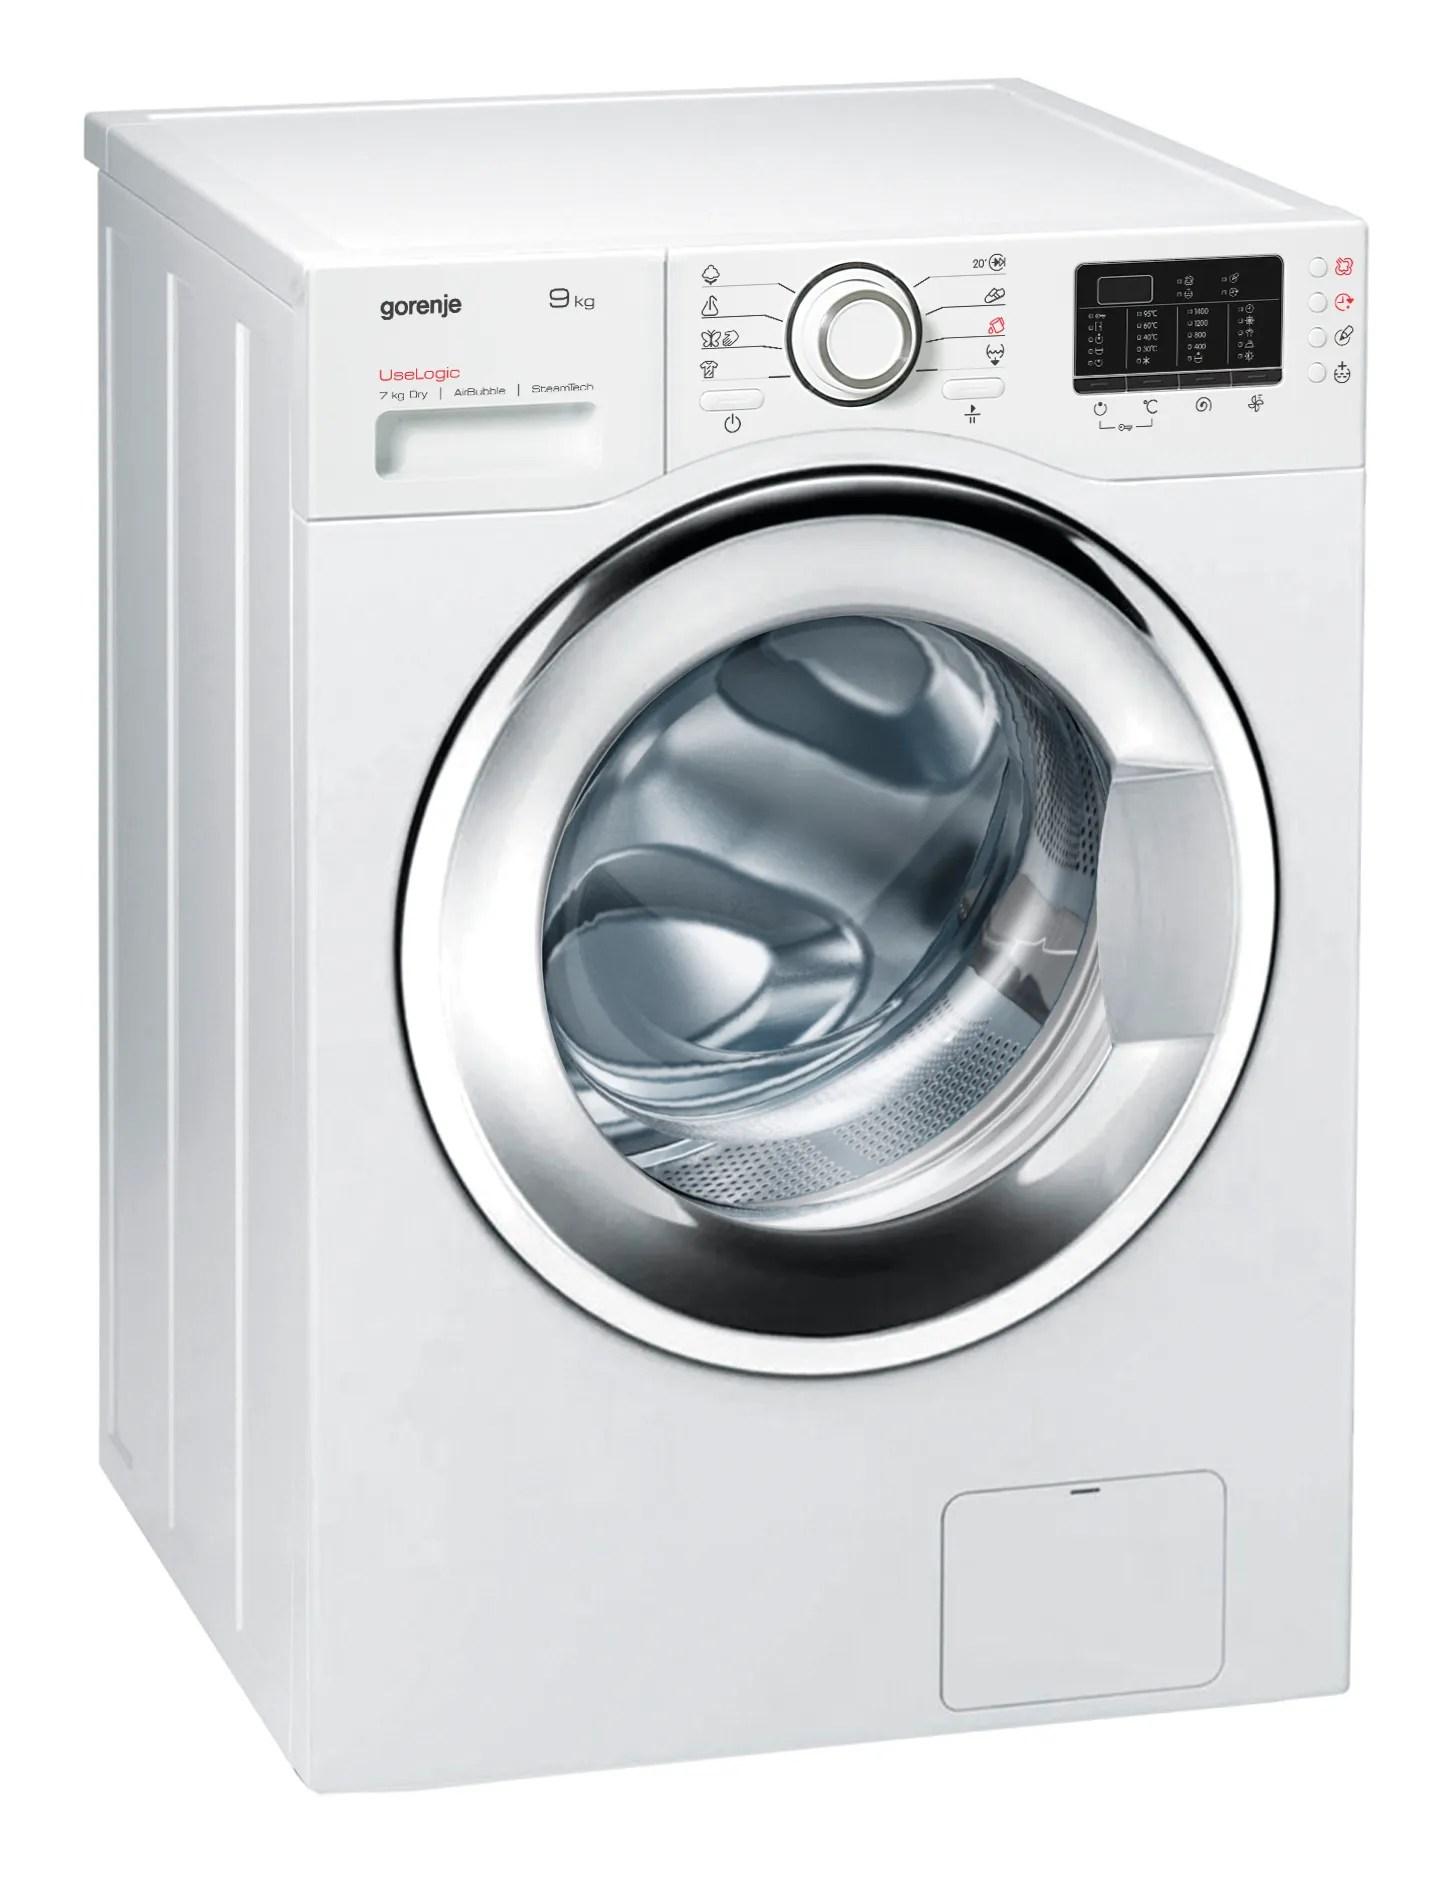 Washing-drying machine WD95140 - Gorenje on Washing Machine  id=94529